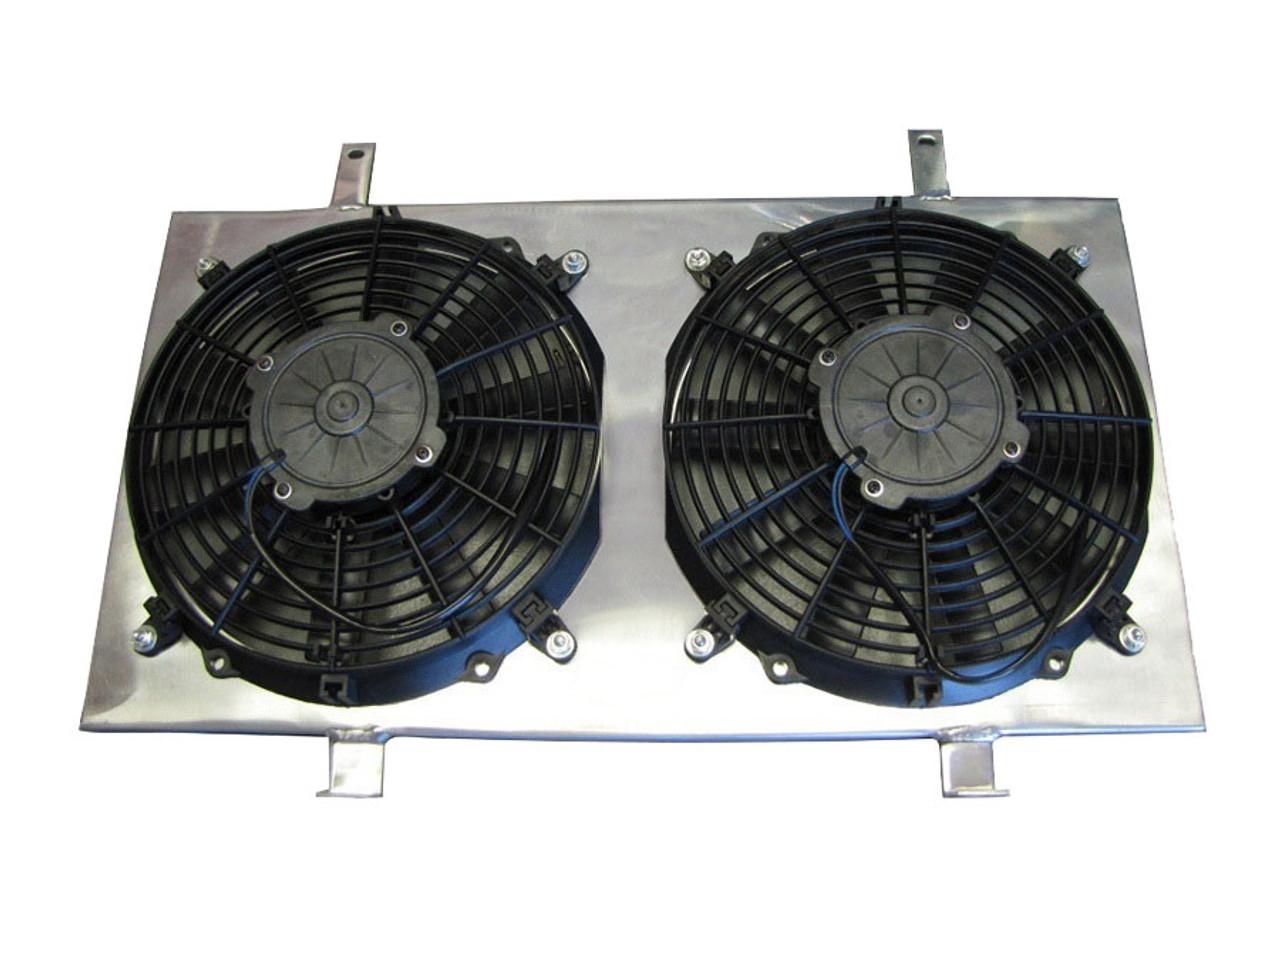 Isr Performance Radiator Fan Shroud Kit Nissan 240sx 95 98 Ka24